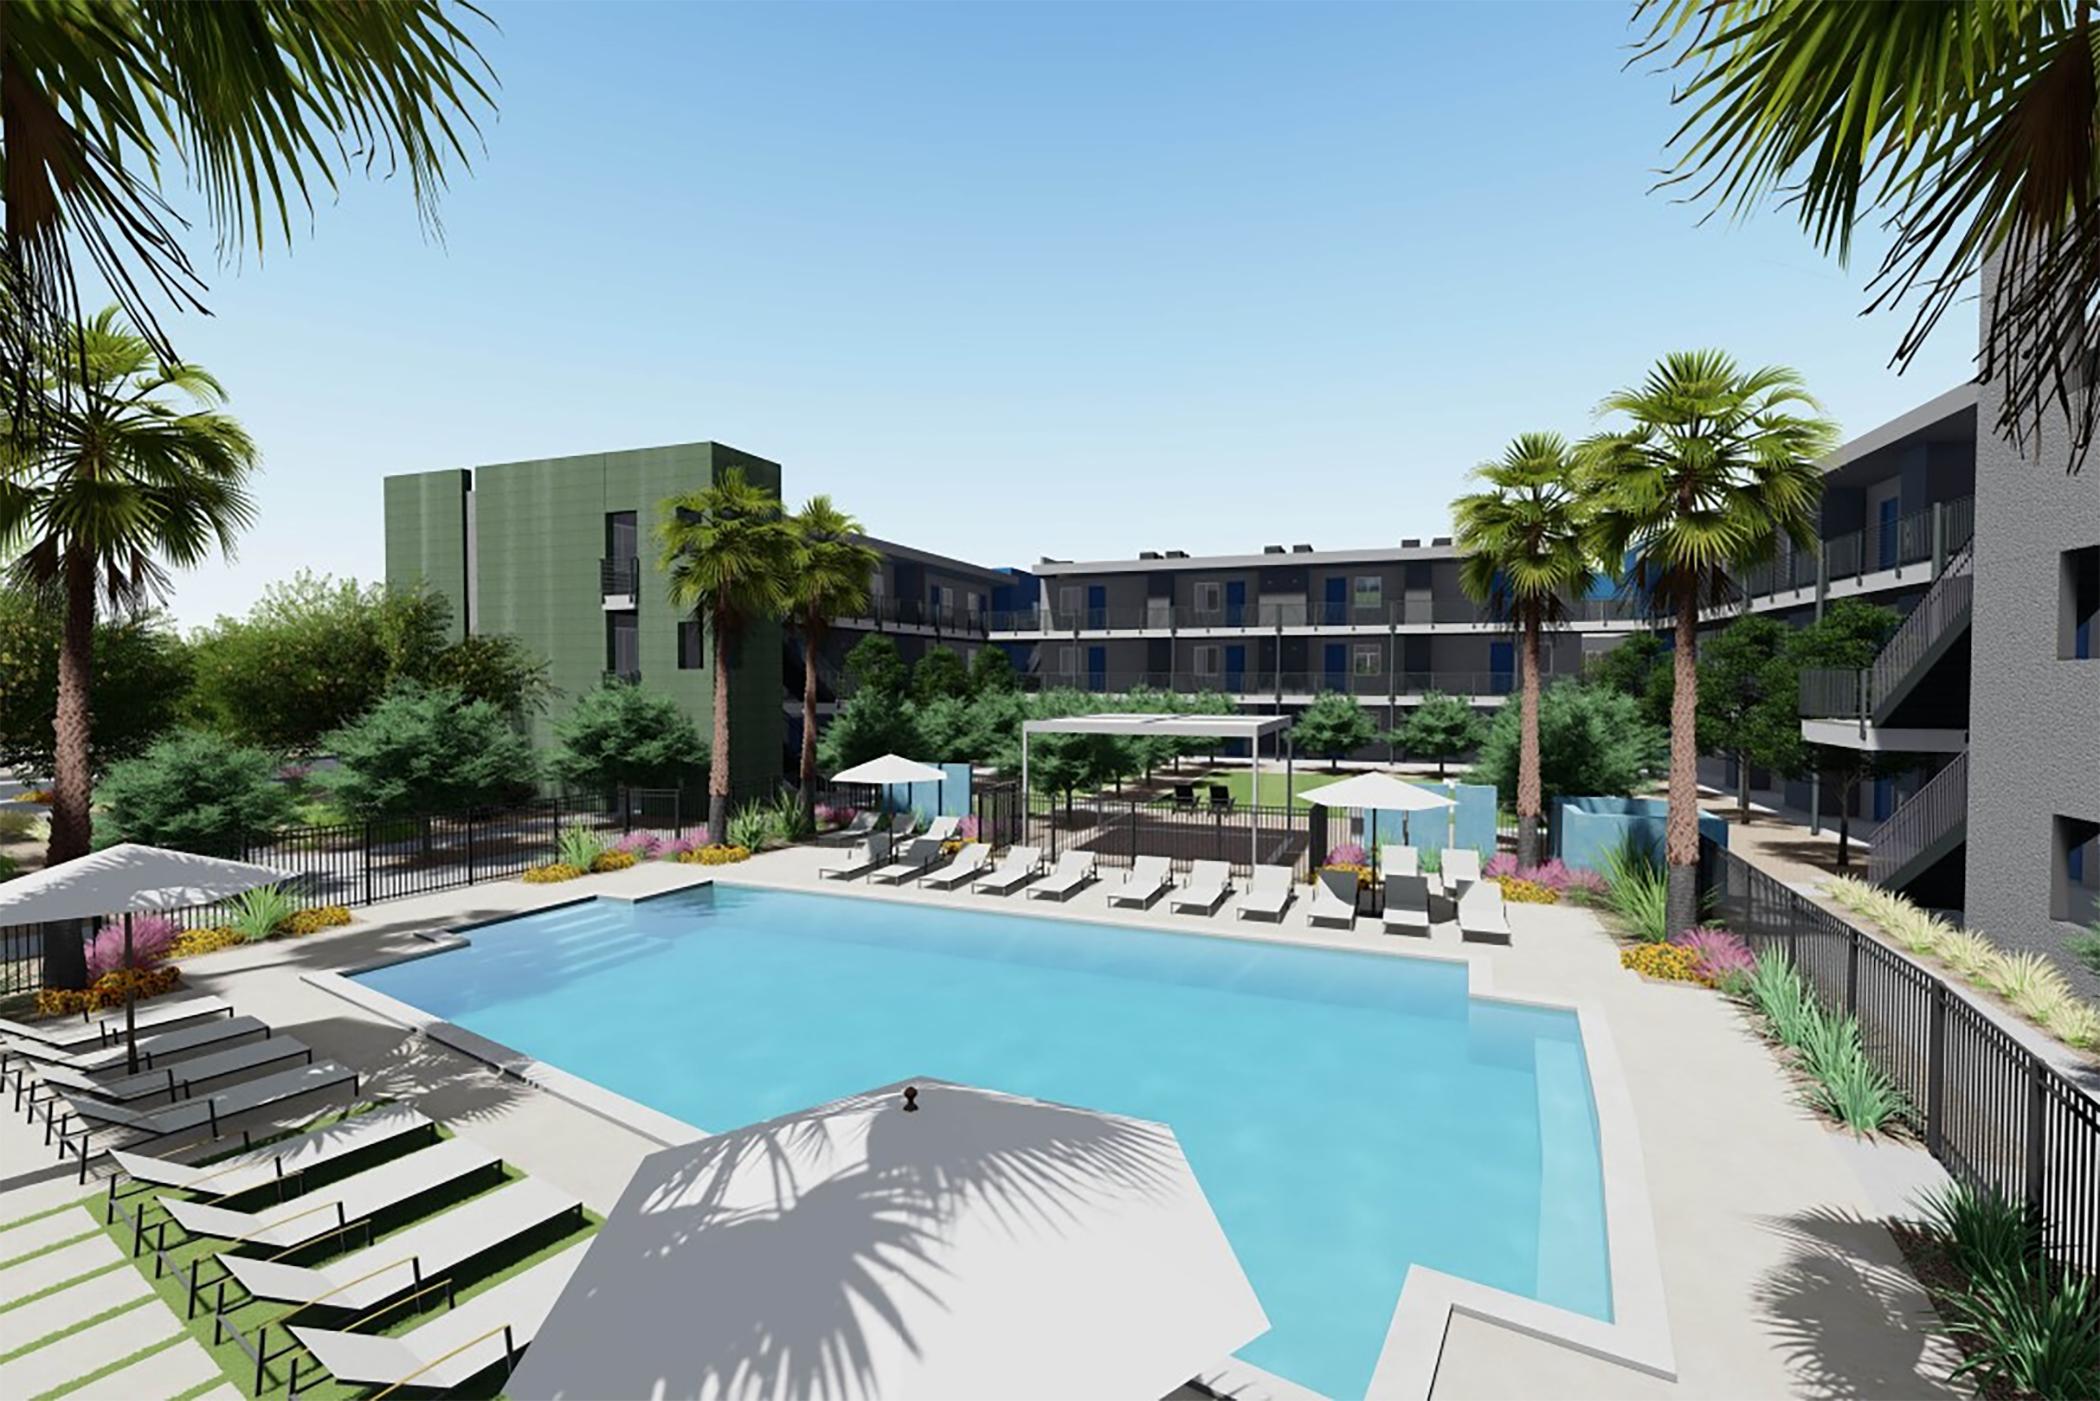 A Scottsdale, Arizona, developer is building Cabana Encanto. (Greenlight Communities)